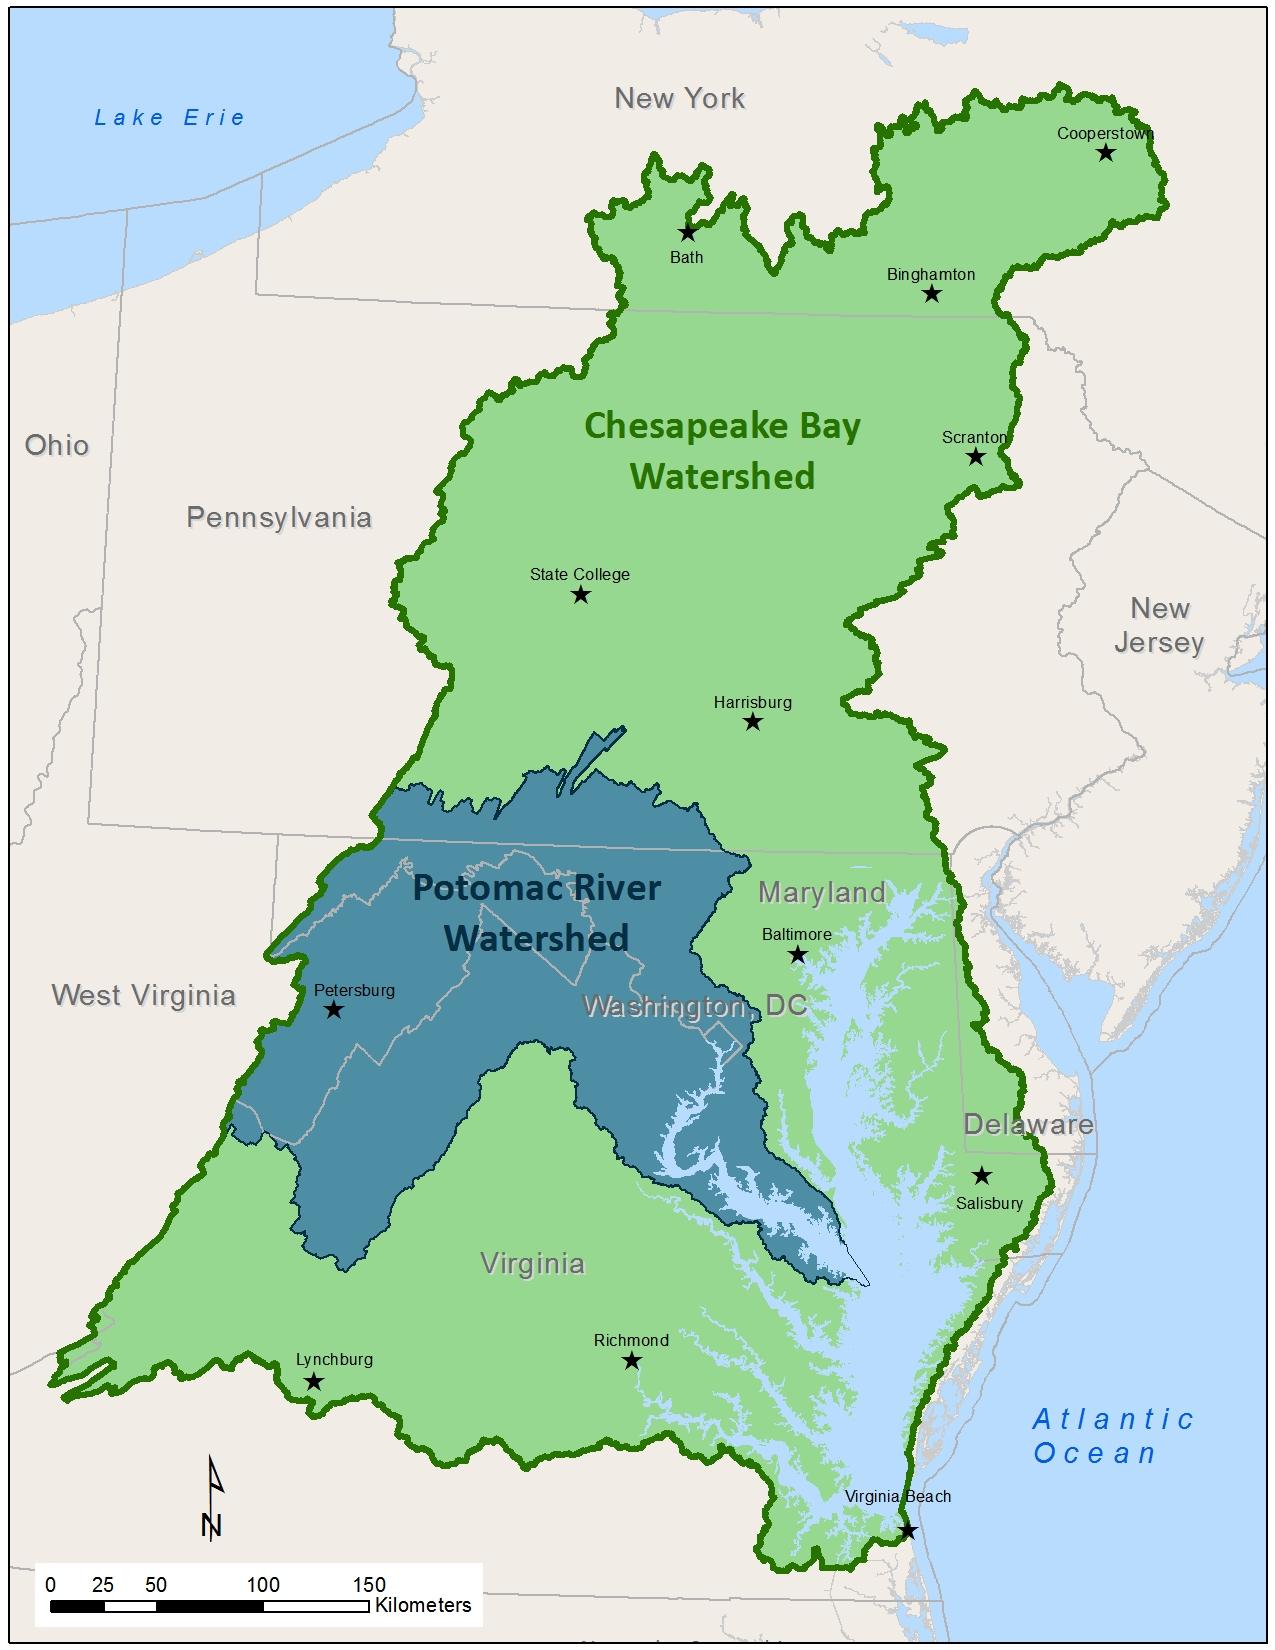 Icprb And The Chesapeake Bay Program